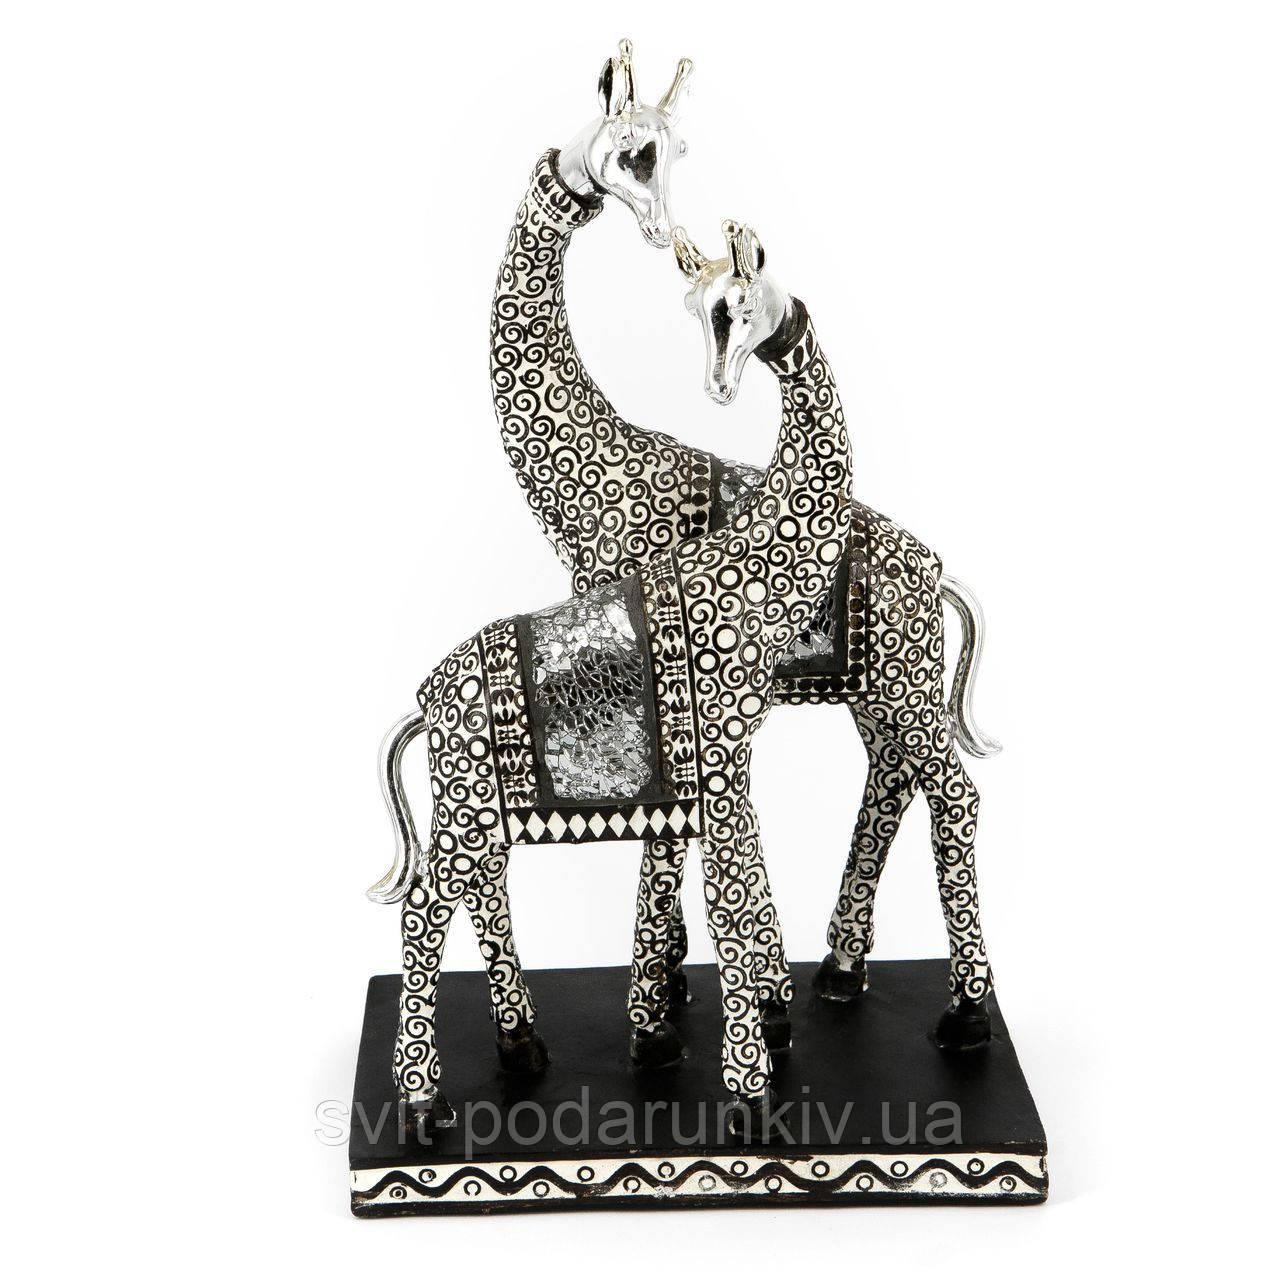 статуэтки жирафов